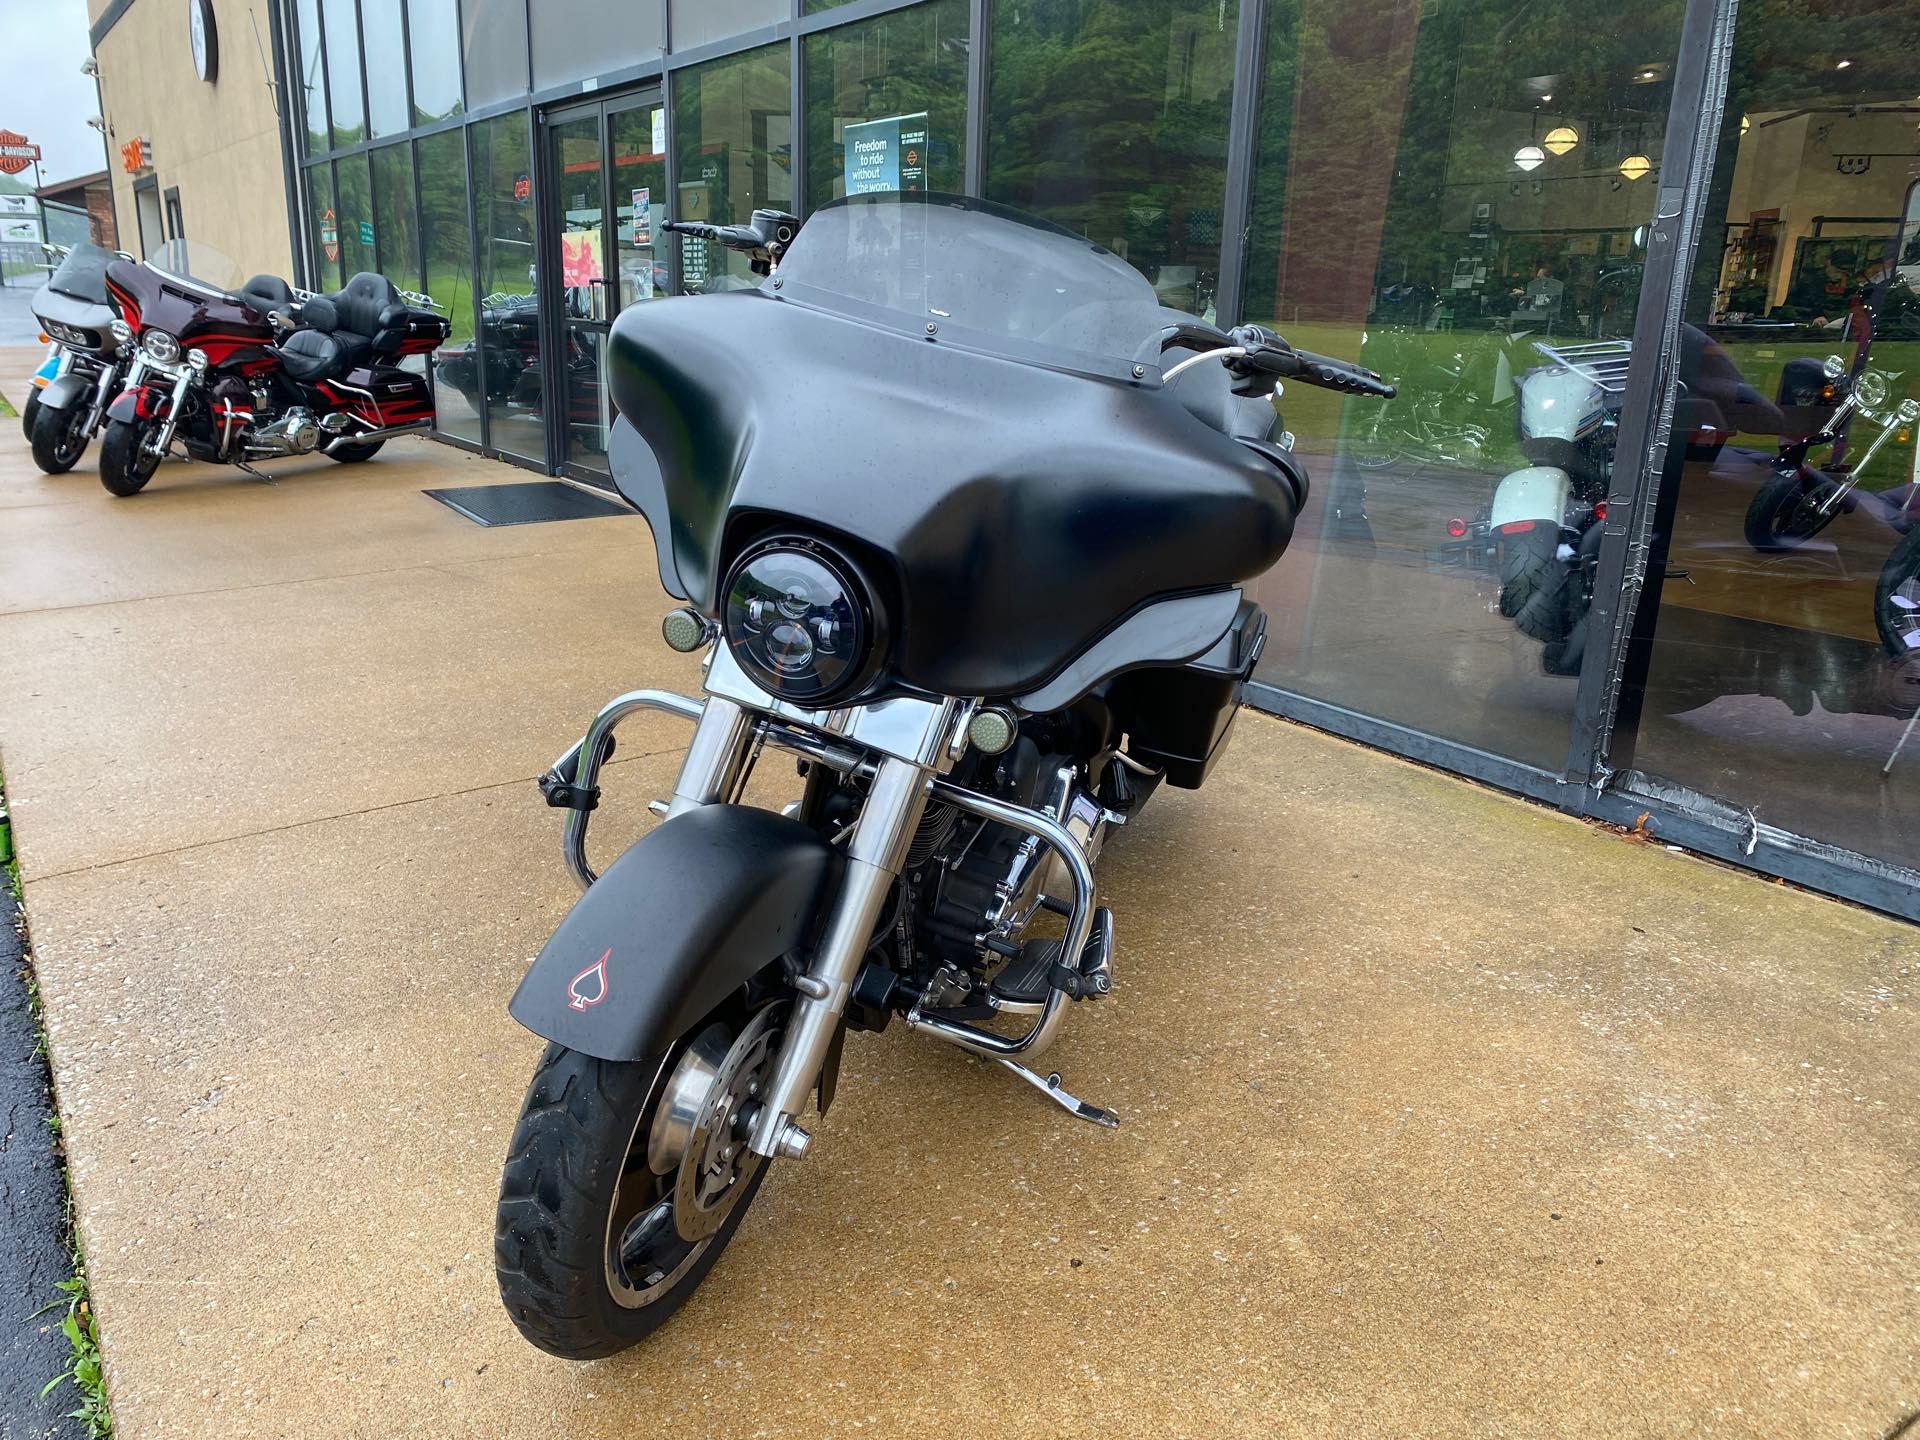 2011 Harley-Davidson Street Glide Base at Gold Star Harley-Davidson